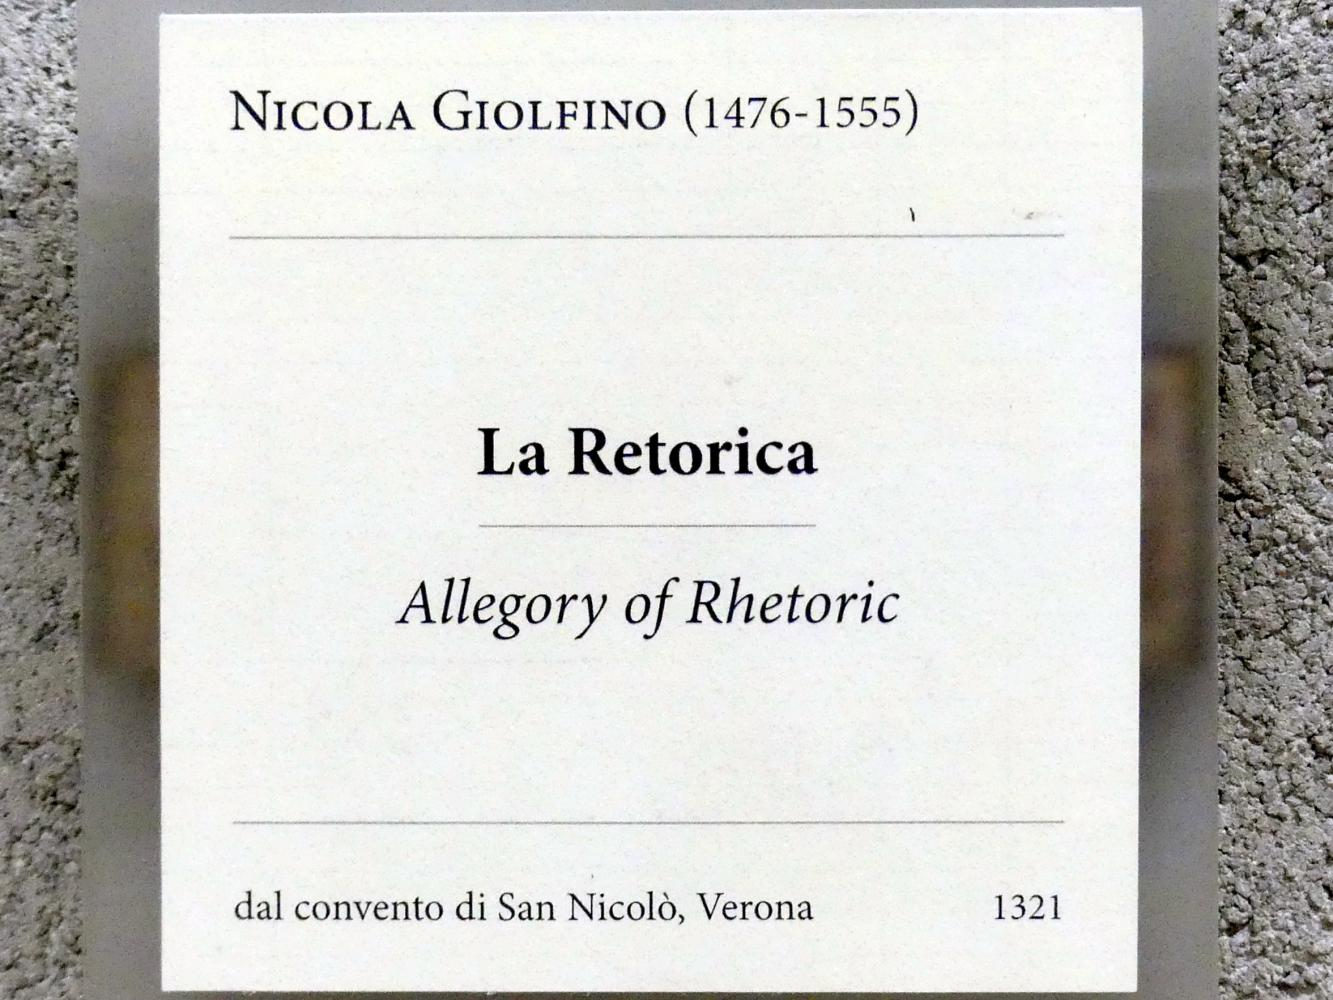 Nicola (Nicolò) Giolfino: Allegorie der Rhetorik, Undatiert